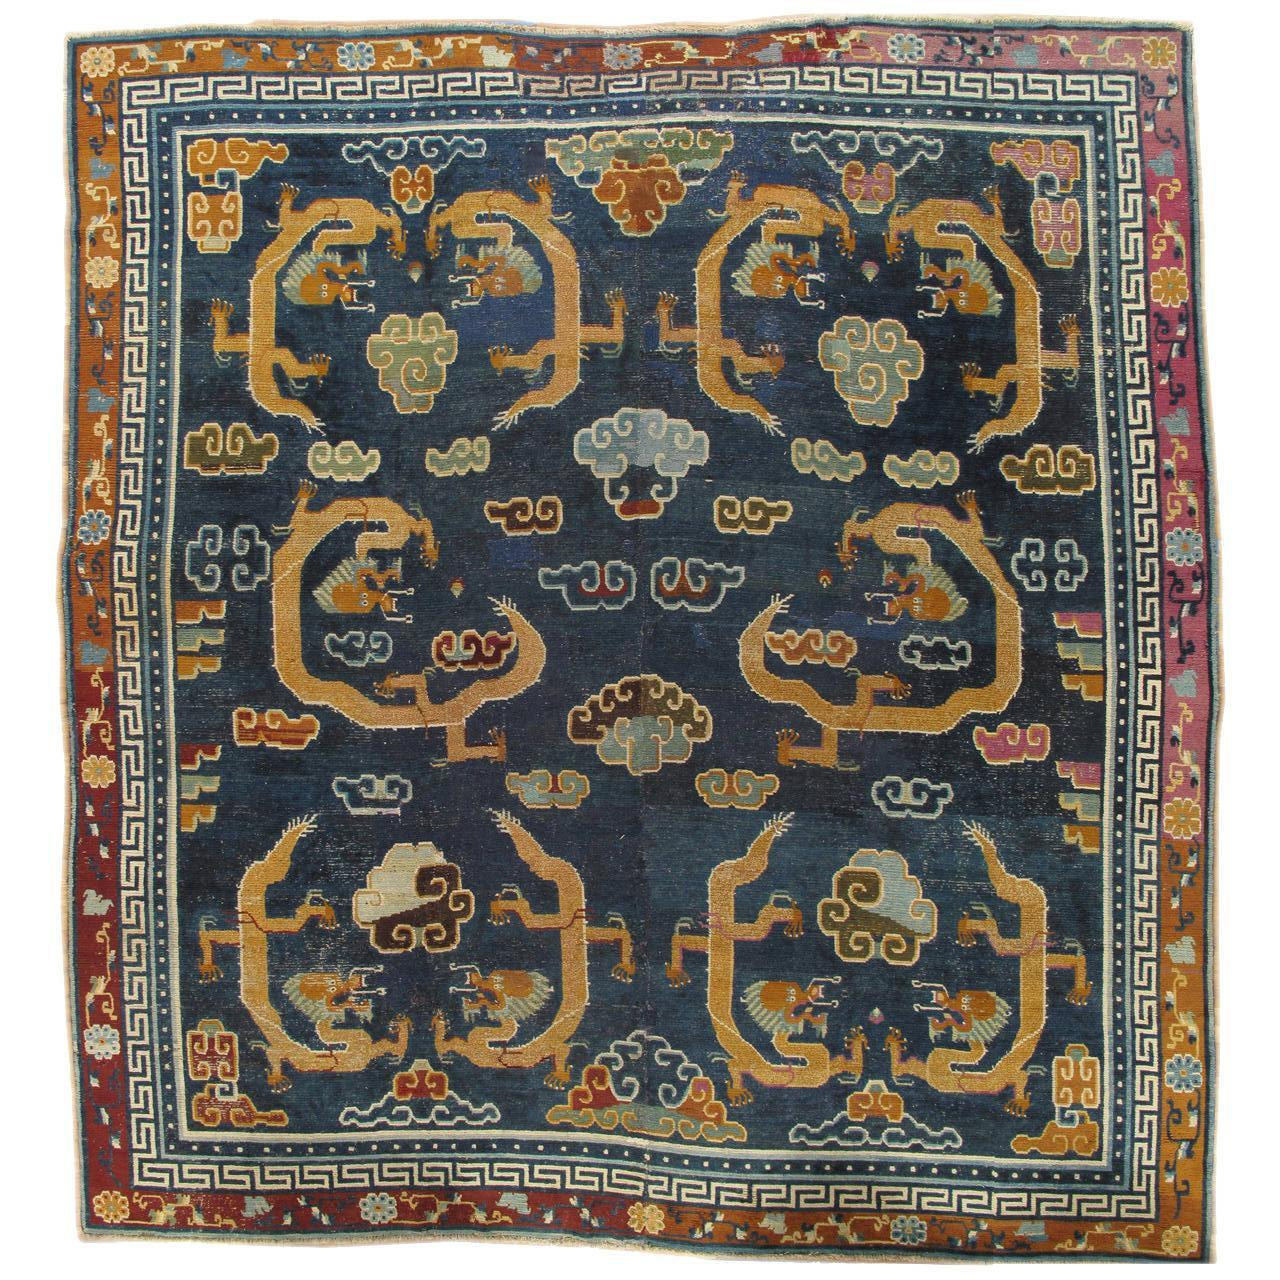 Antique Tibetan Rug: Antique Tibetan Carpet For Sale At 1stdibs